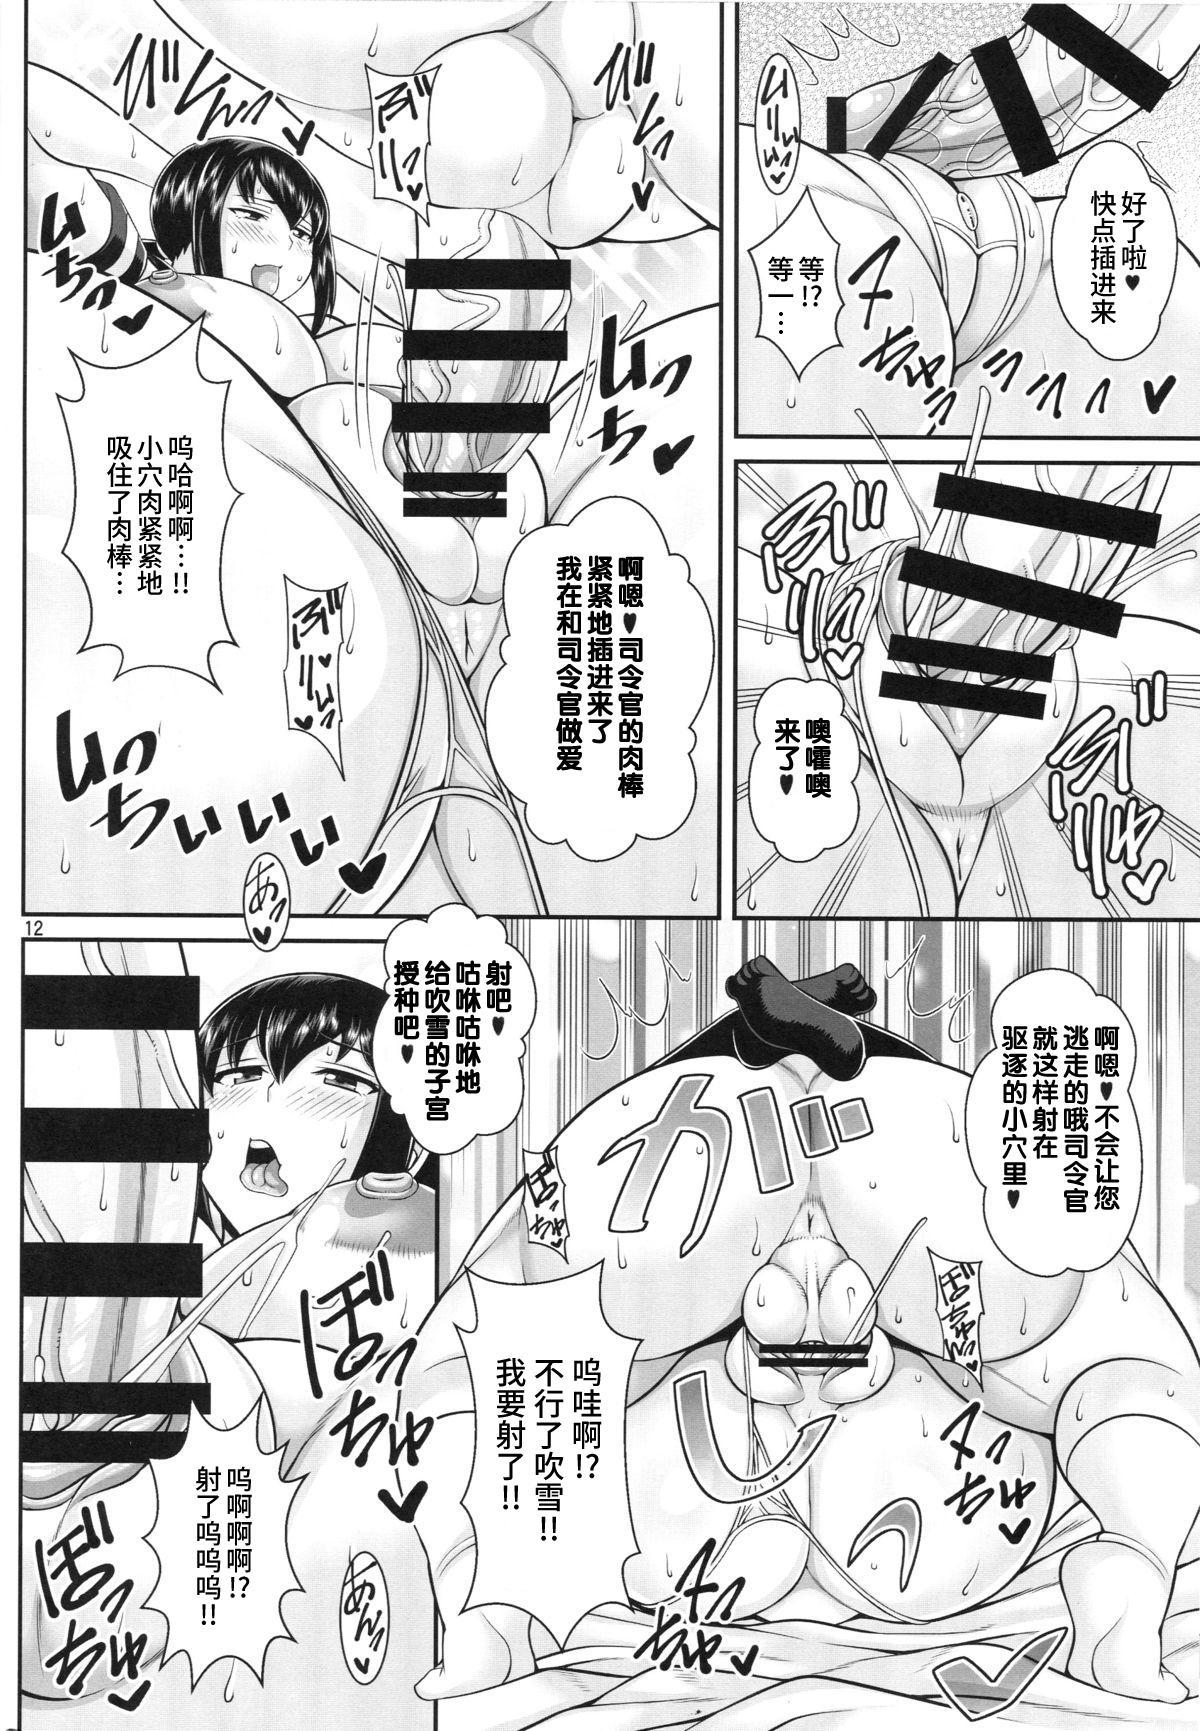 Fubuki, ShikoNuki su! 11